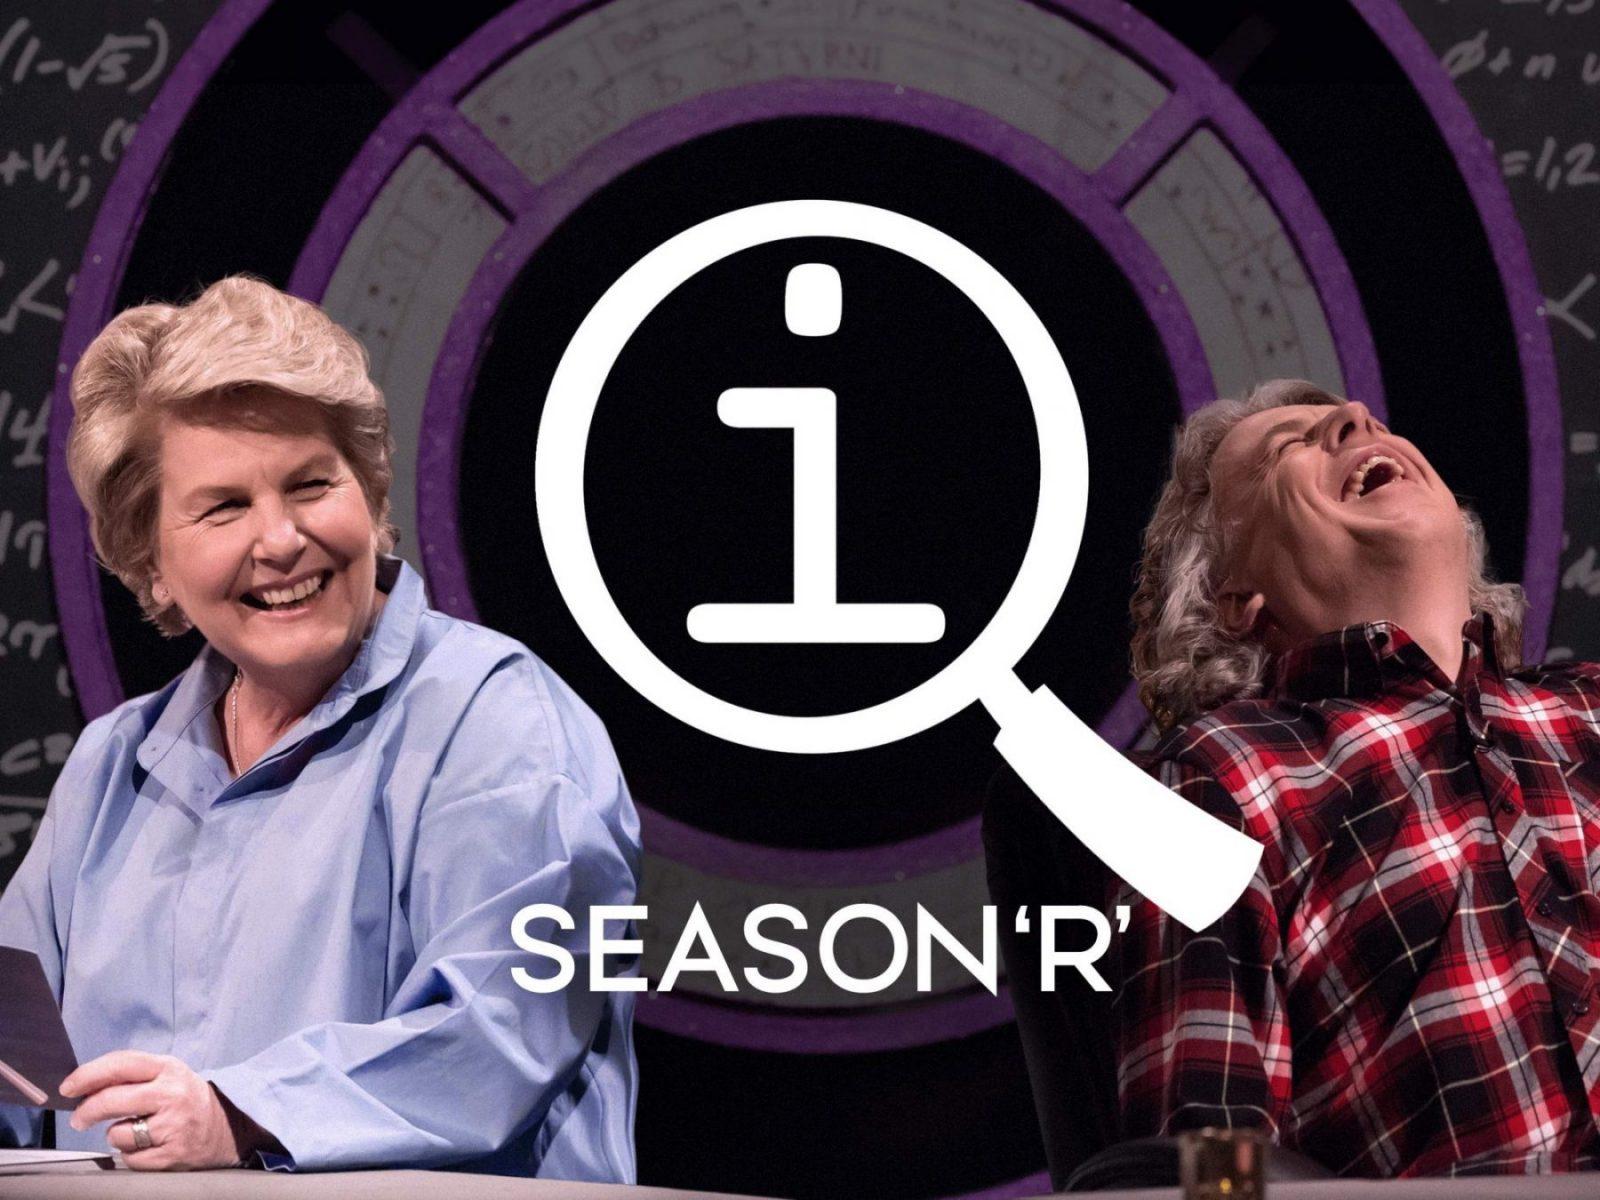 QI Season 19 Episode 1